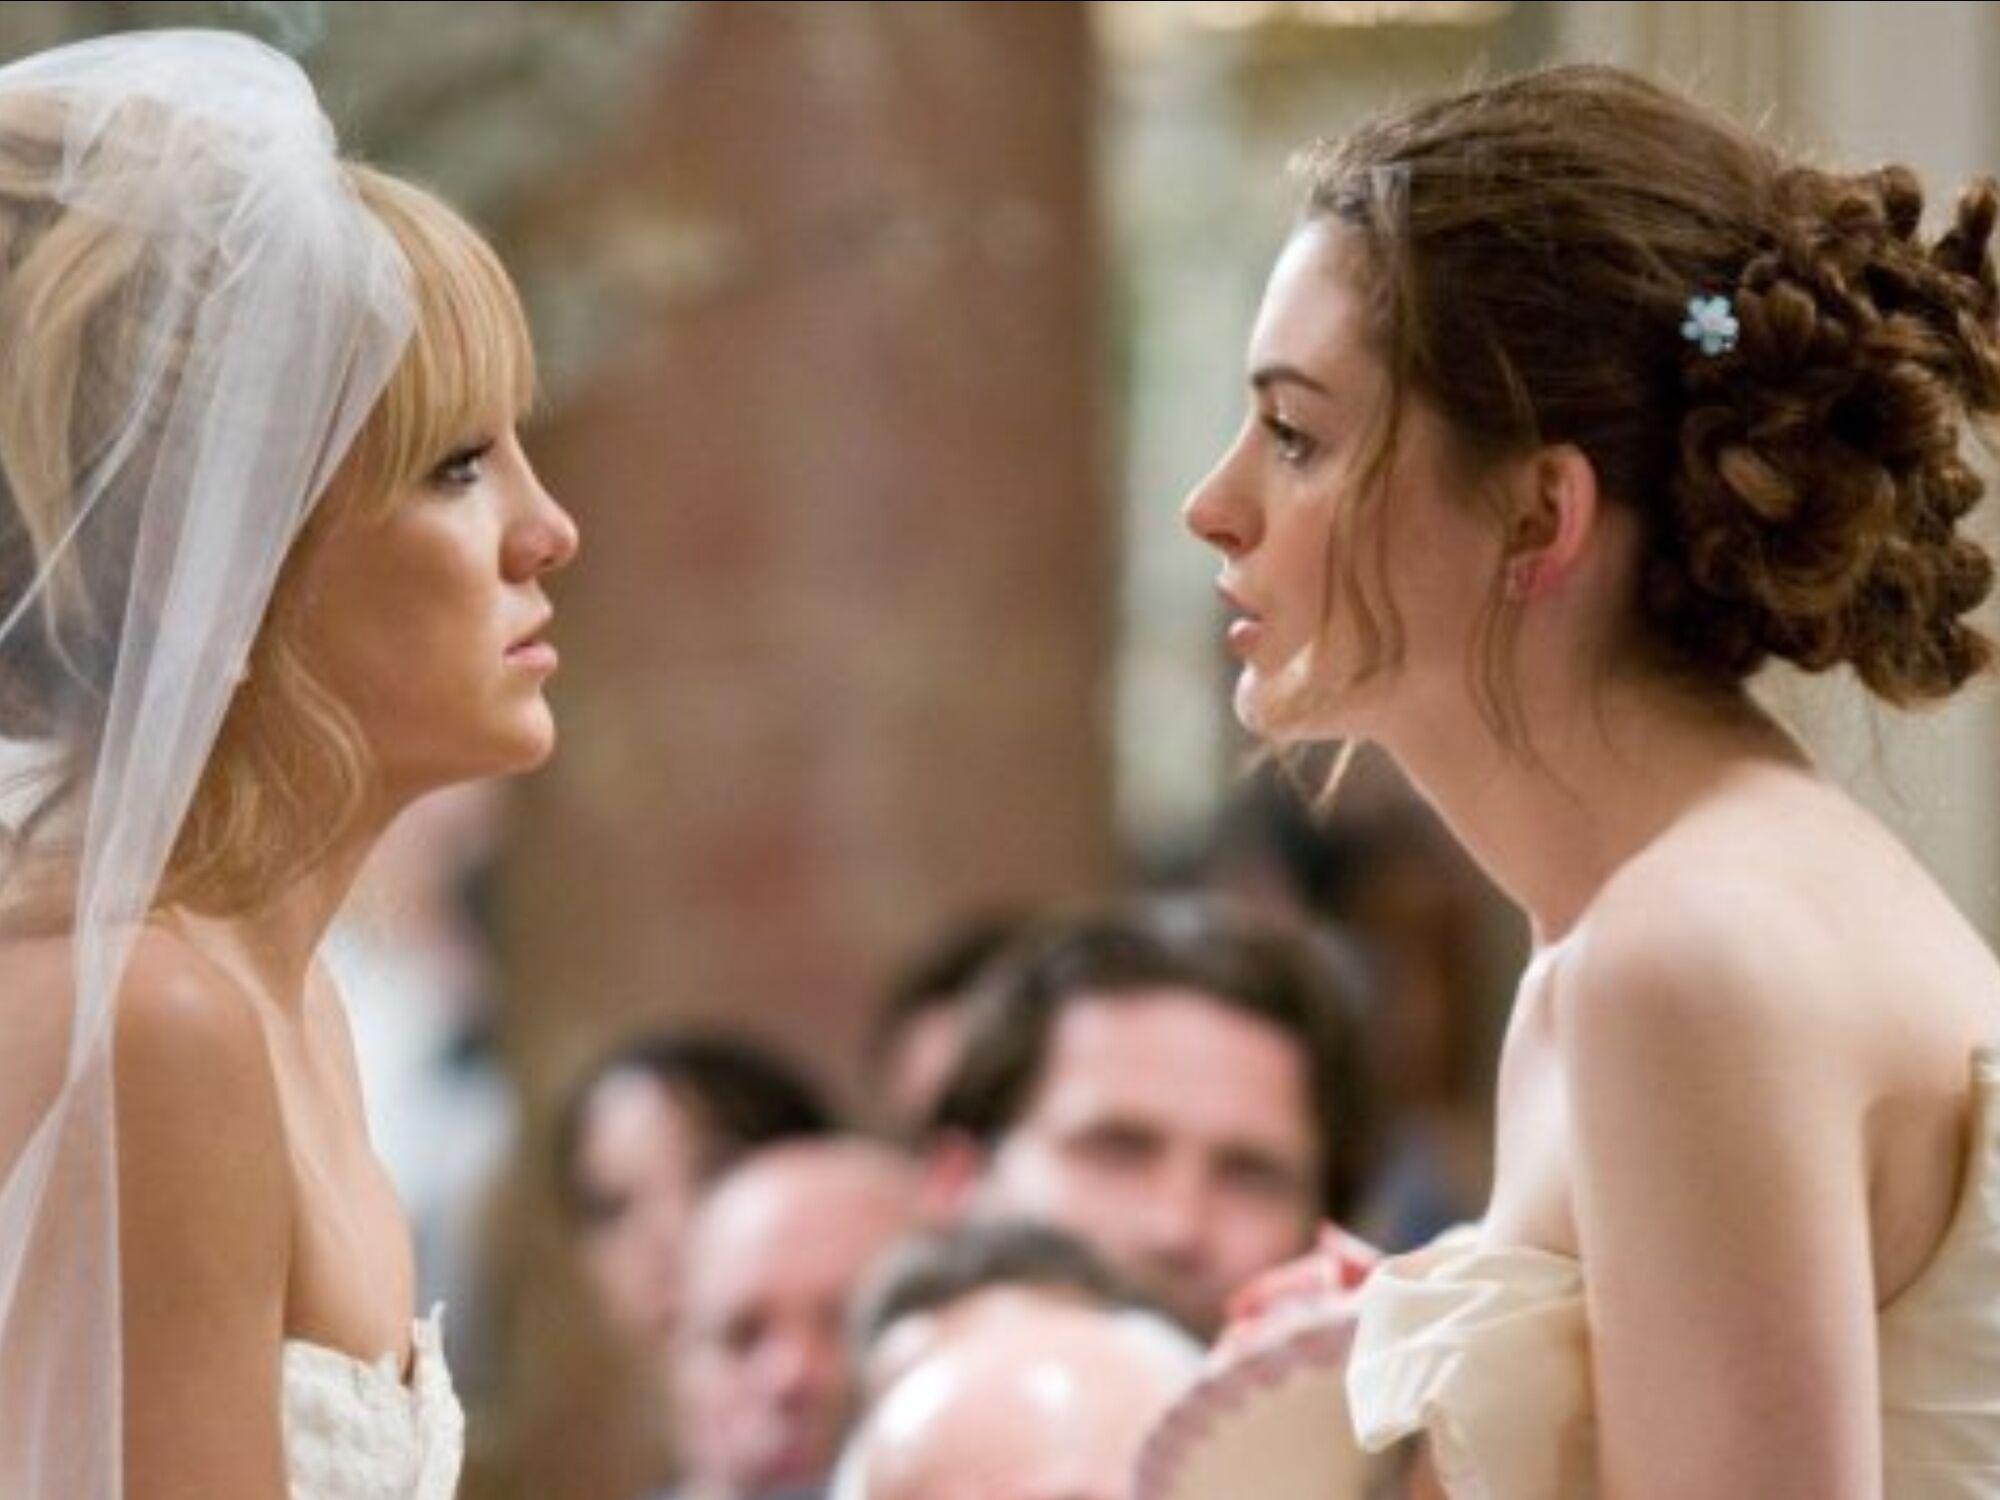 bride wars | movies that rock wiki | fandom powered by wikia